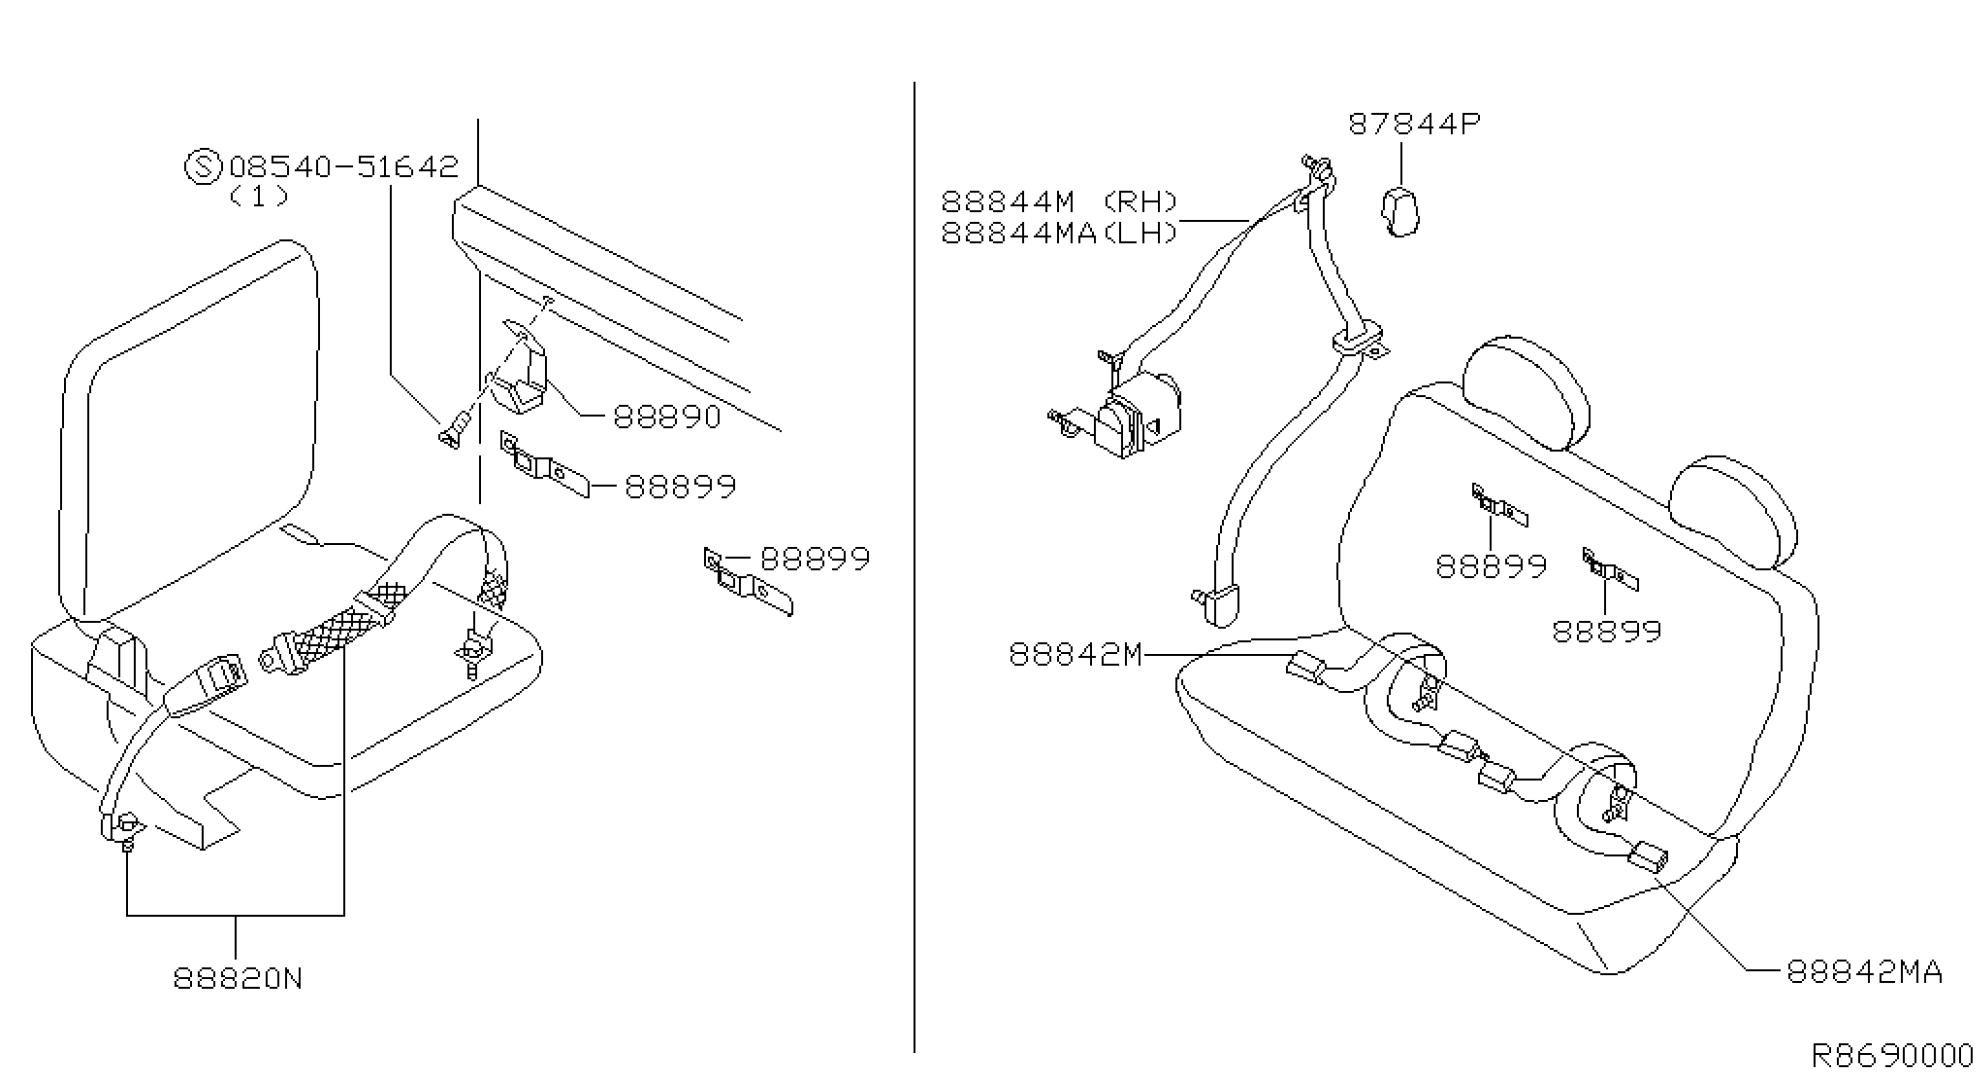 Seat Belt assembly Diagram 2002 Nissan Frontier Crew Cab Oem Parts Nissan Usa Estore Of Seat Belt assembly Diagram